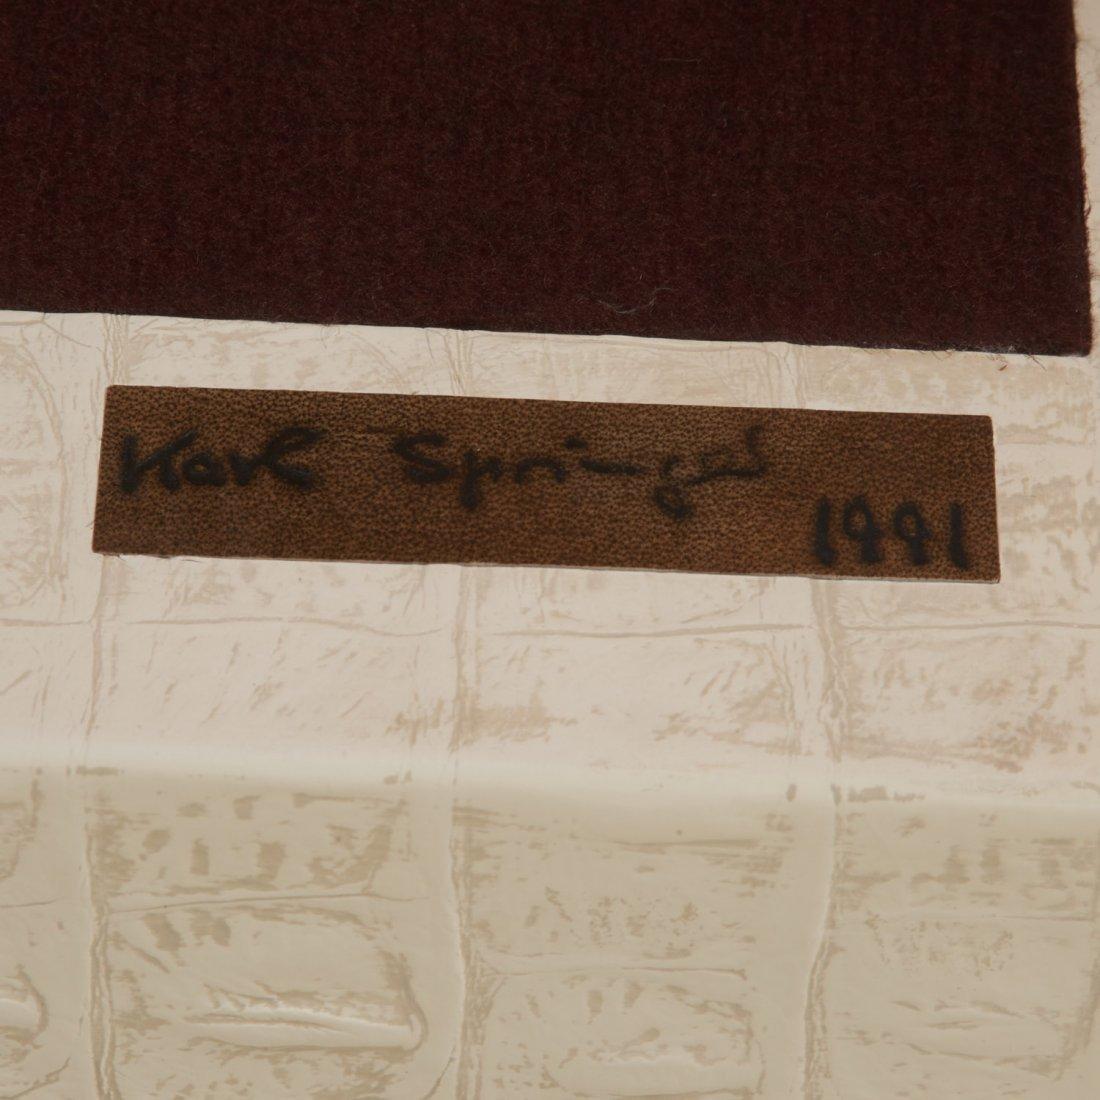 Karl Springer white faux gator sculpture bench - 5